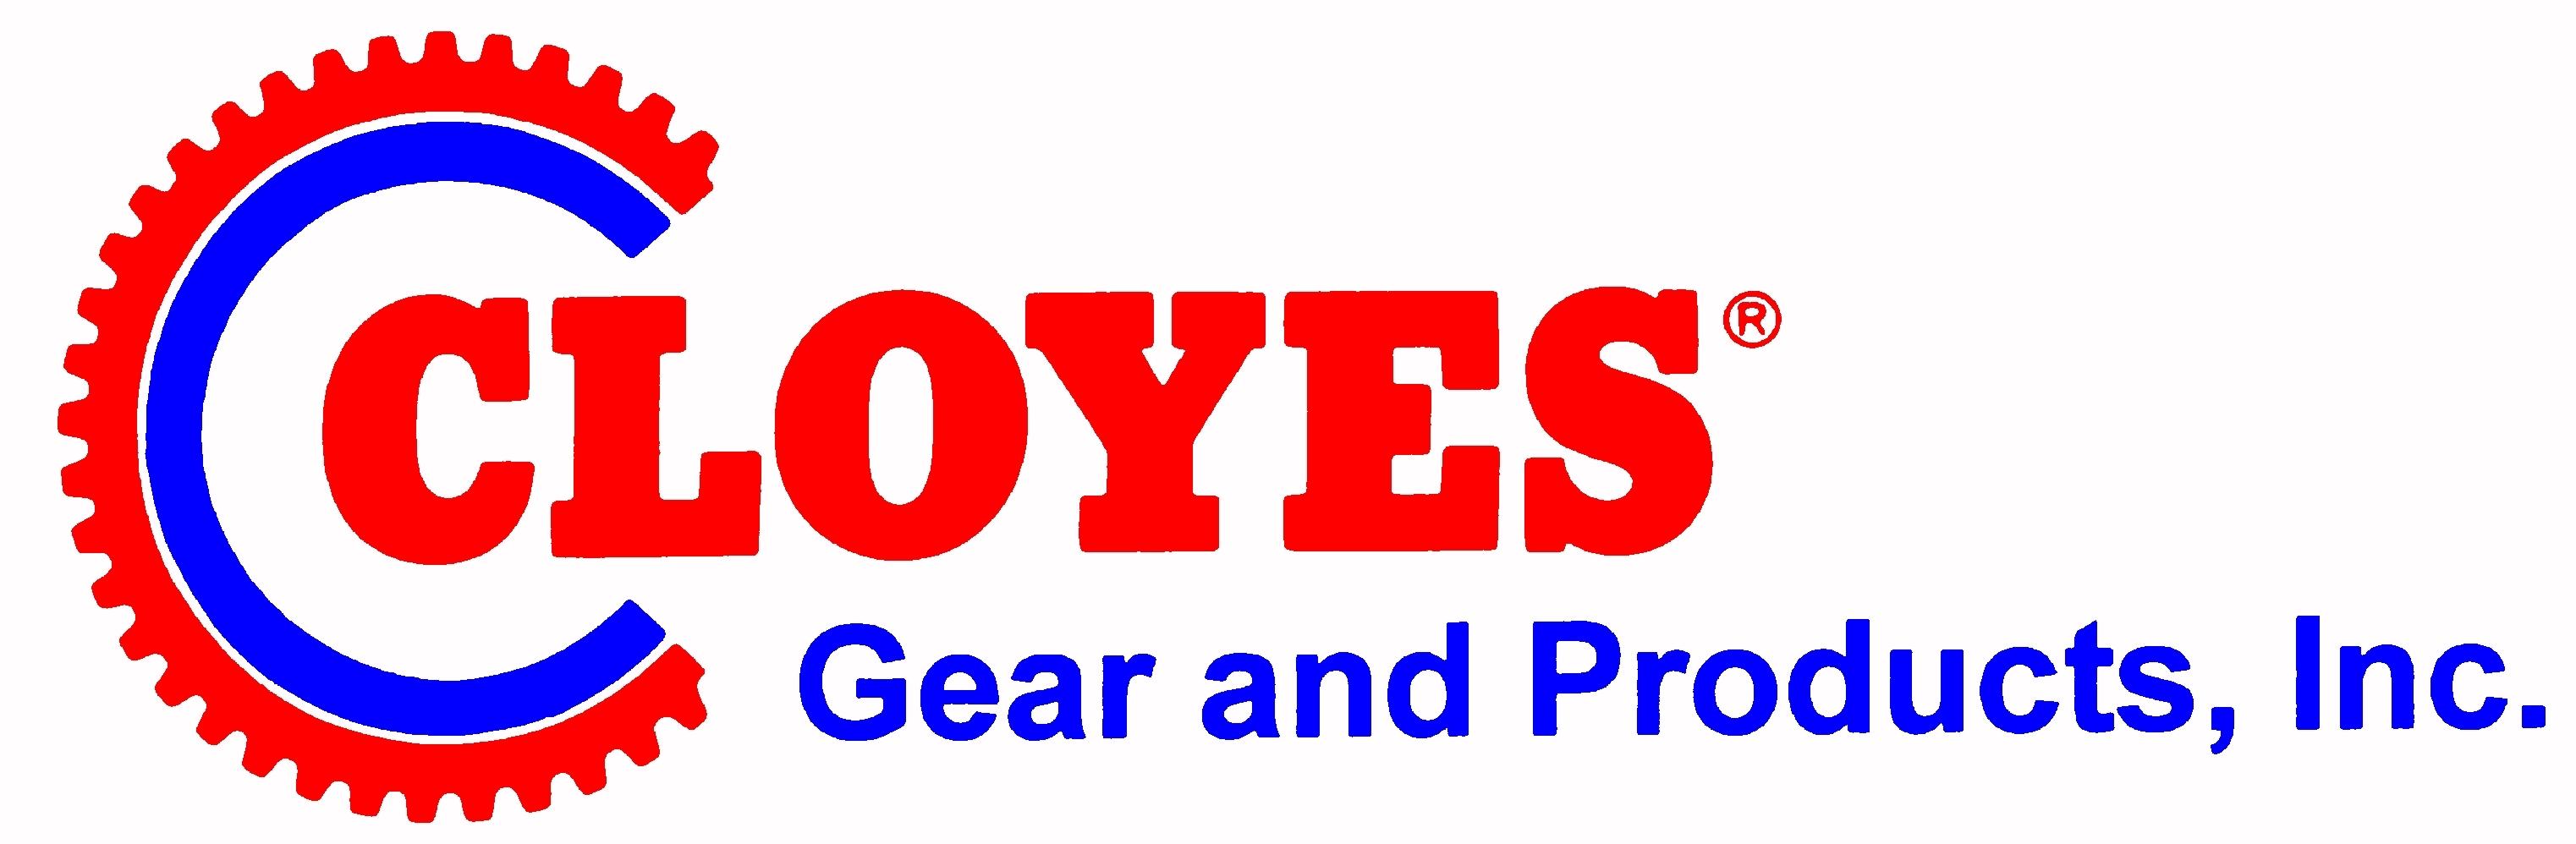 cloyes-logo.jpg